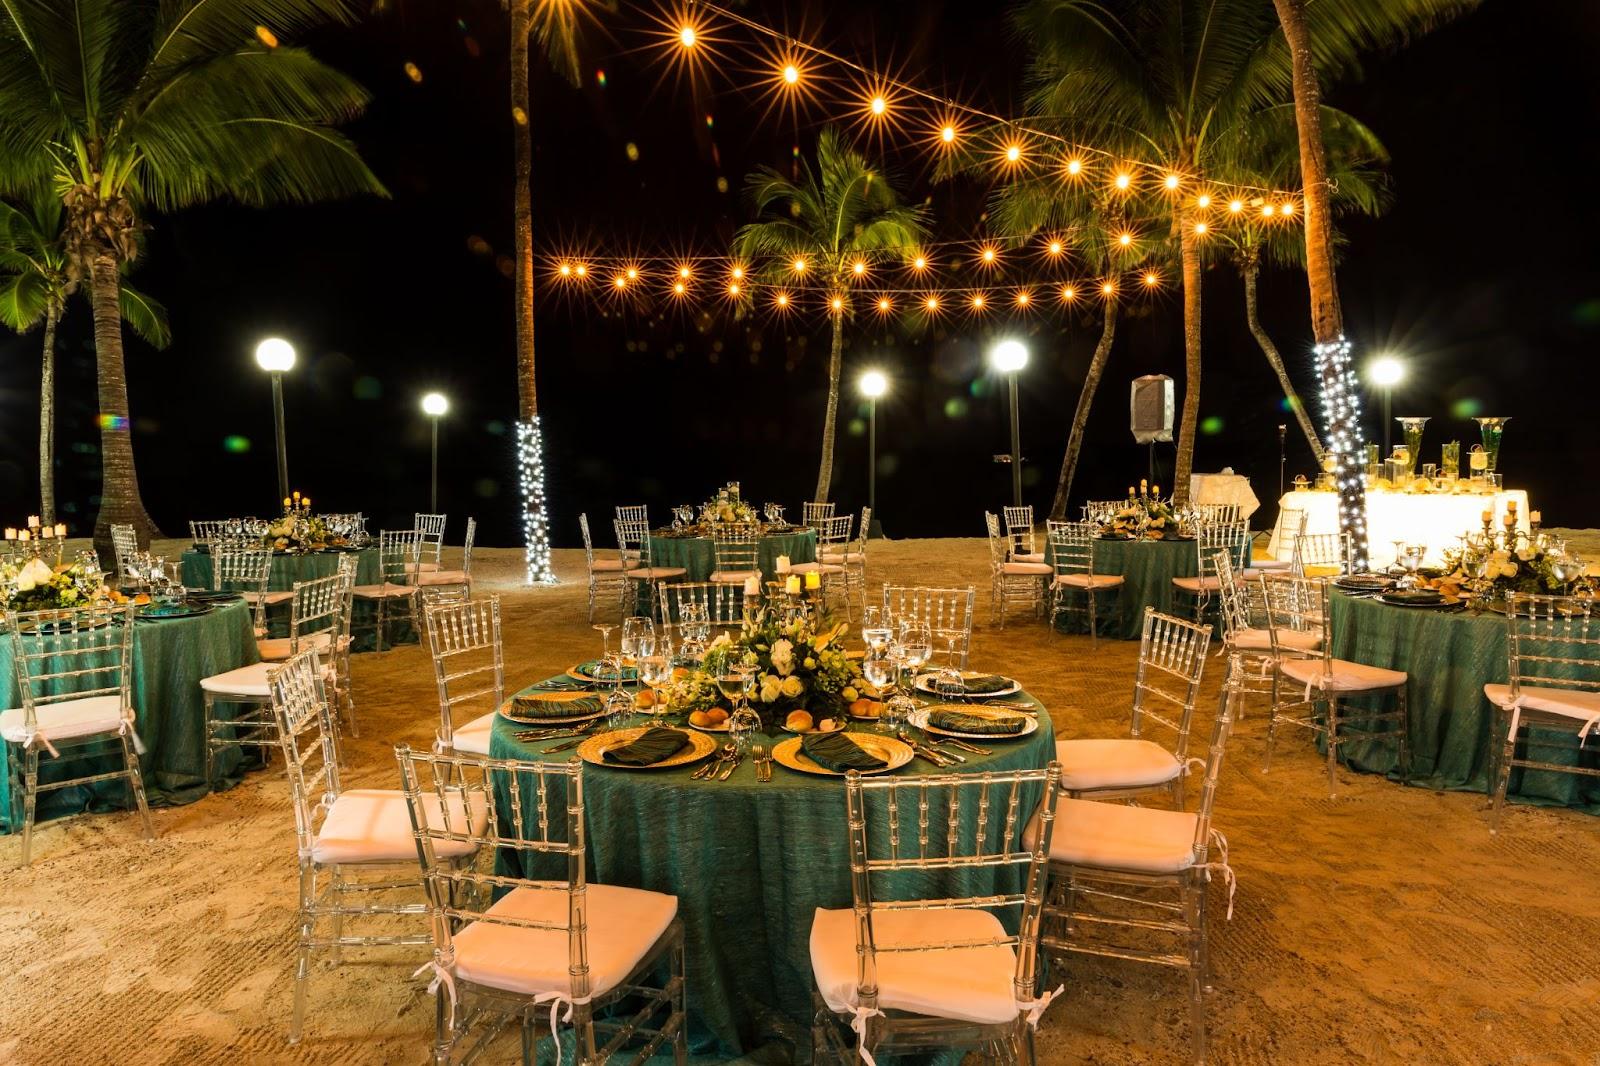 Hotel barcelo riviera maya